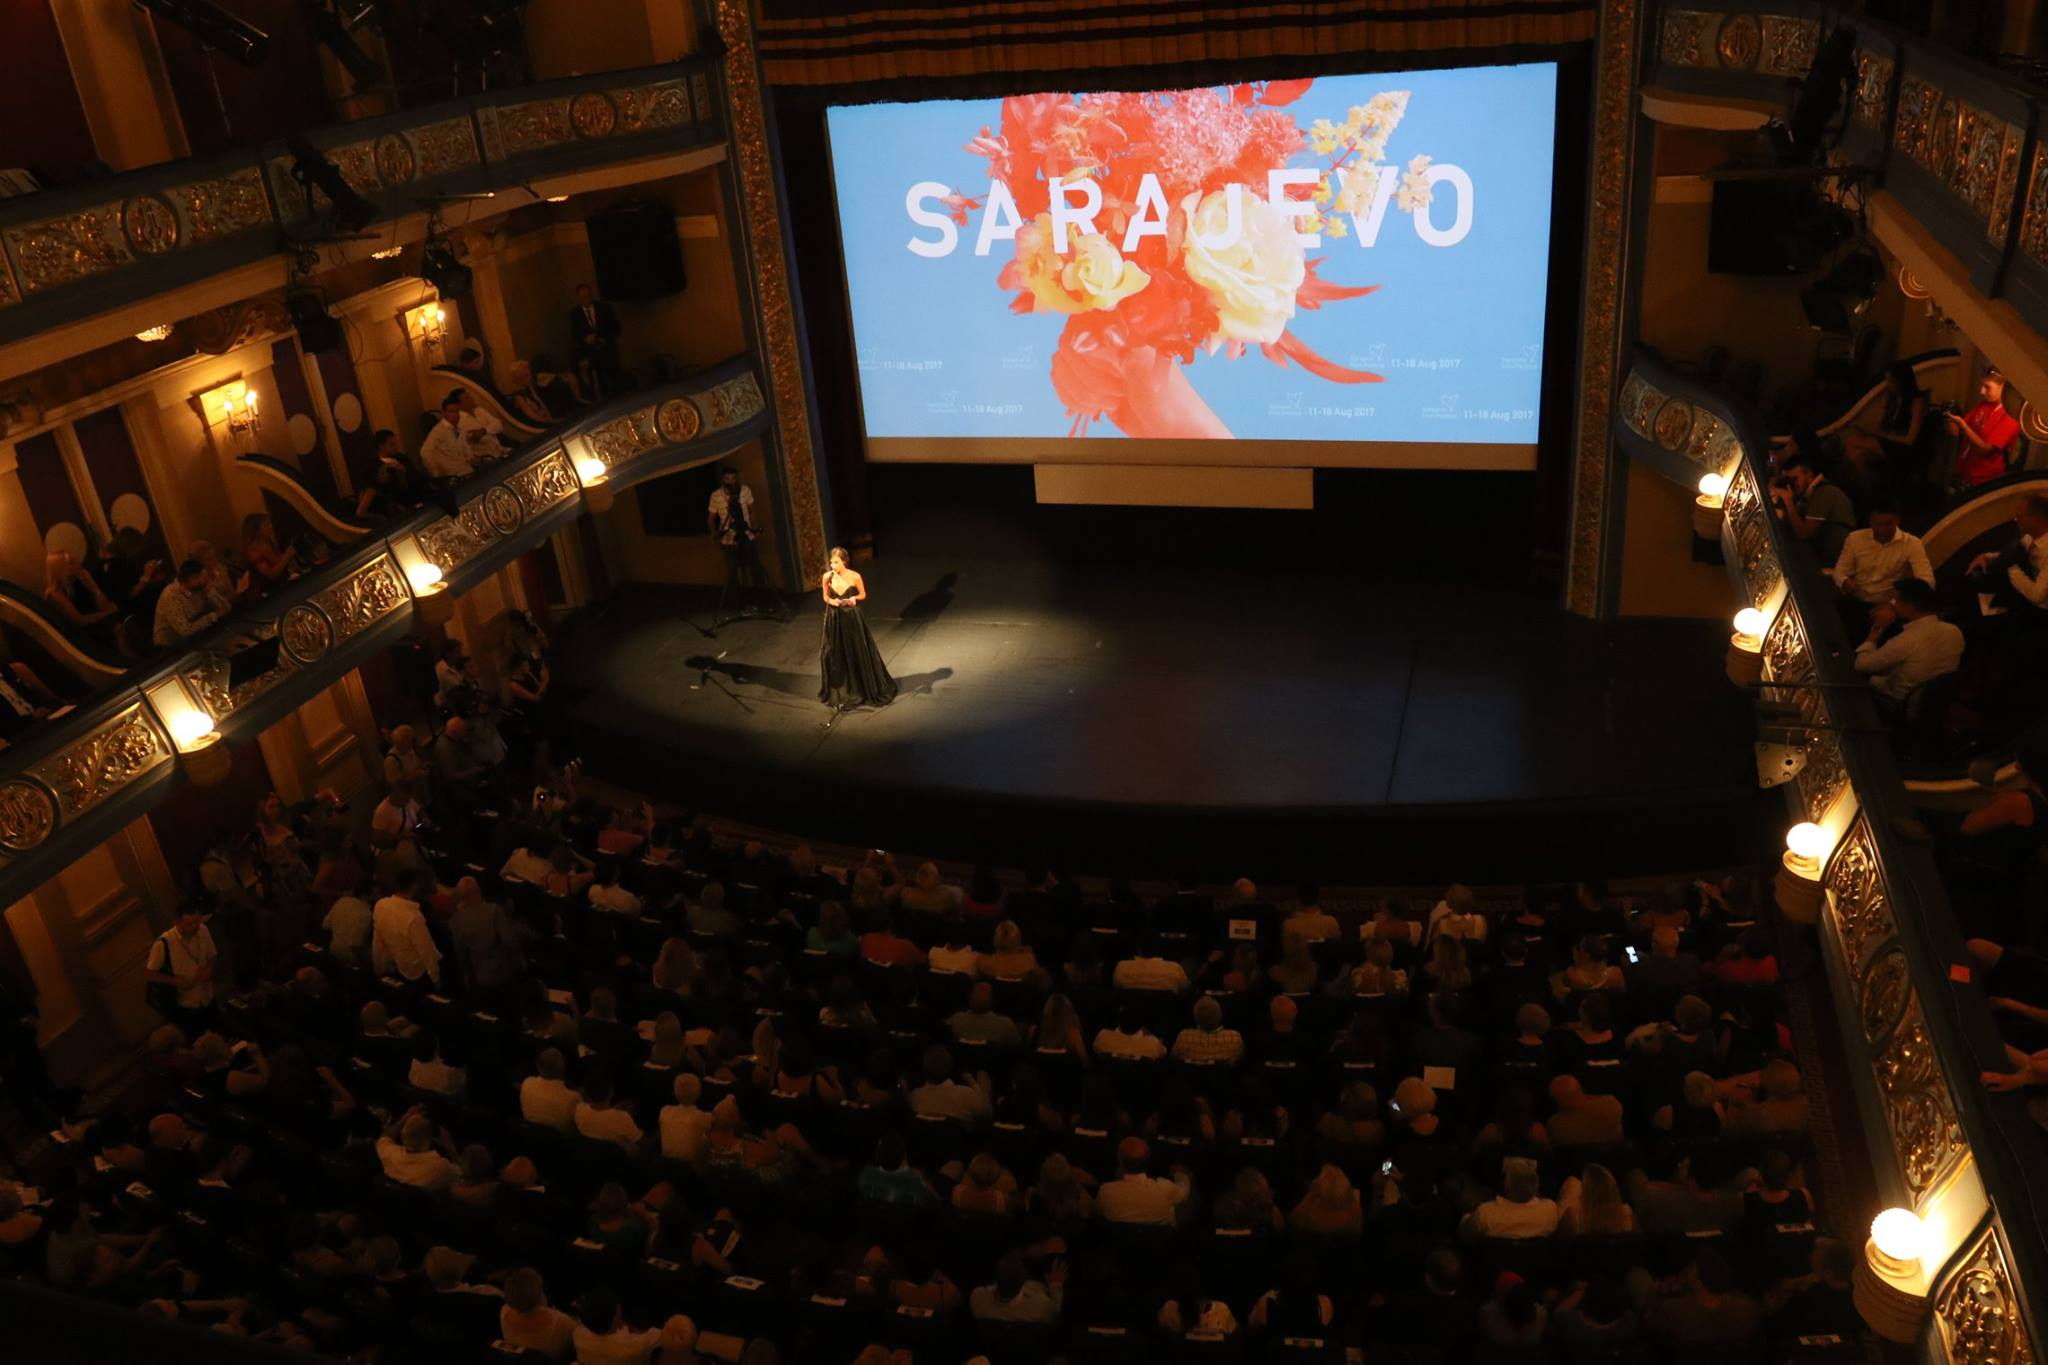 Sarajevo film festival/Photo: facebook@sarajevofilmfestival